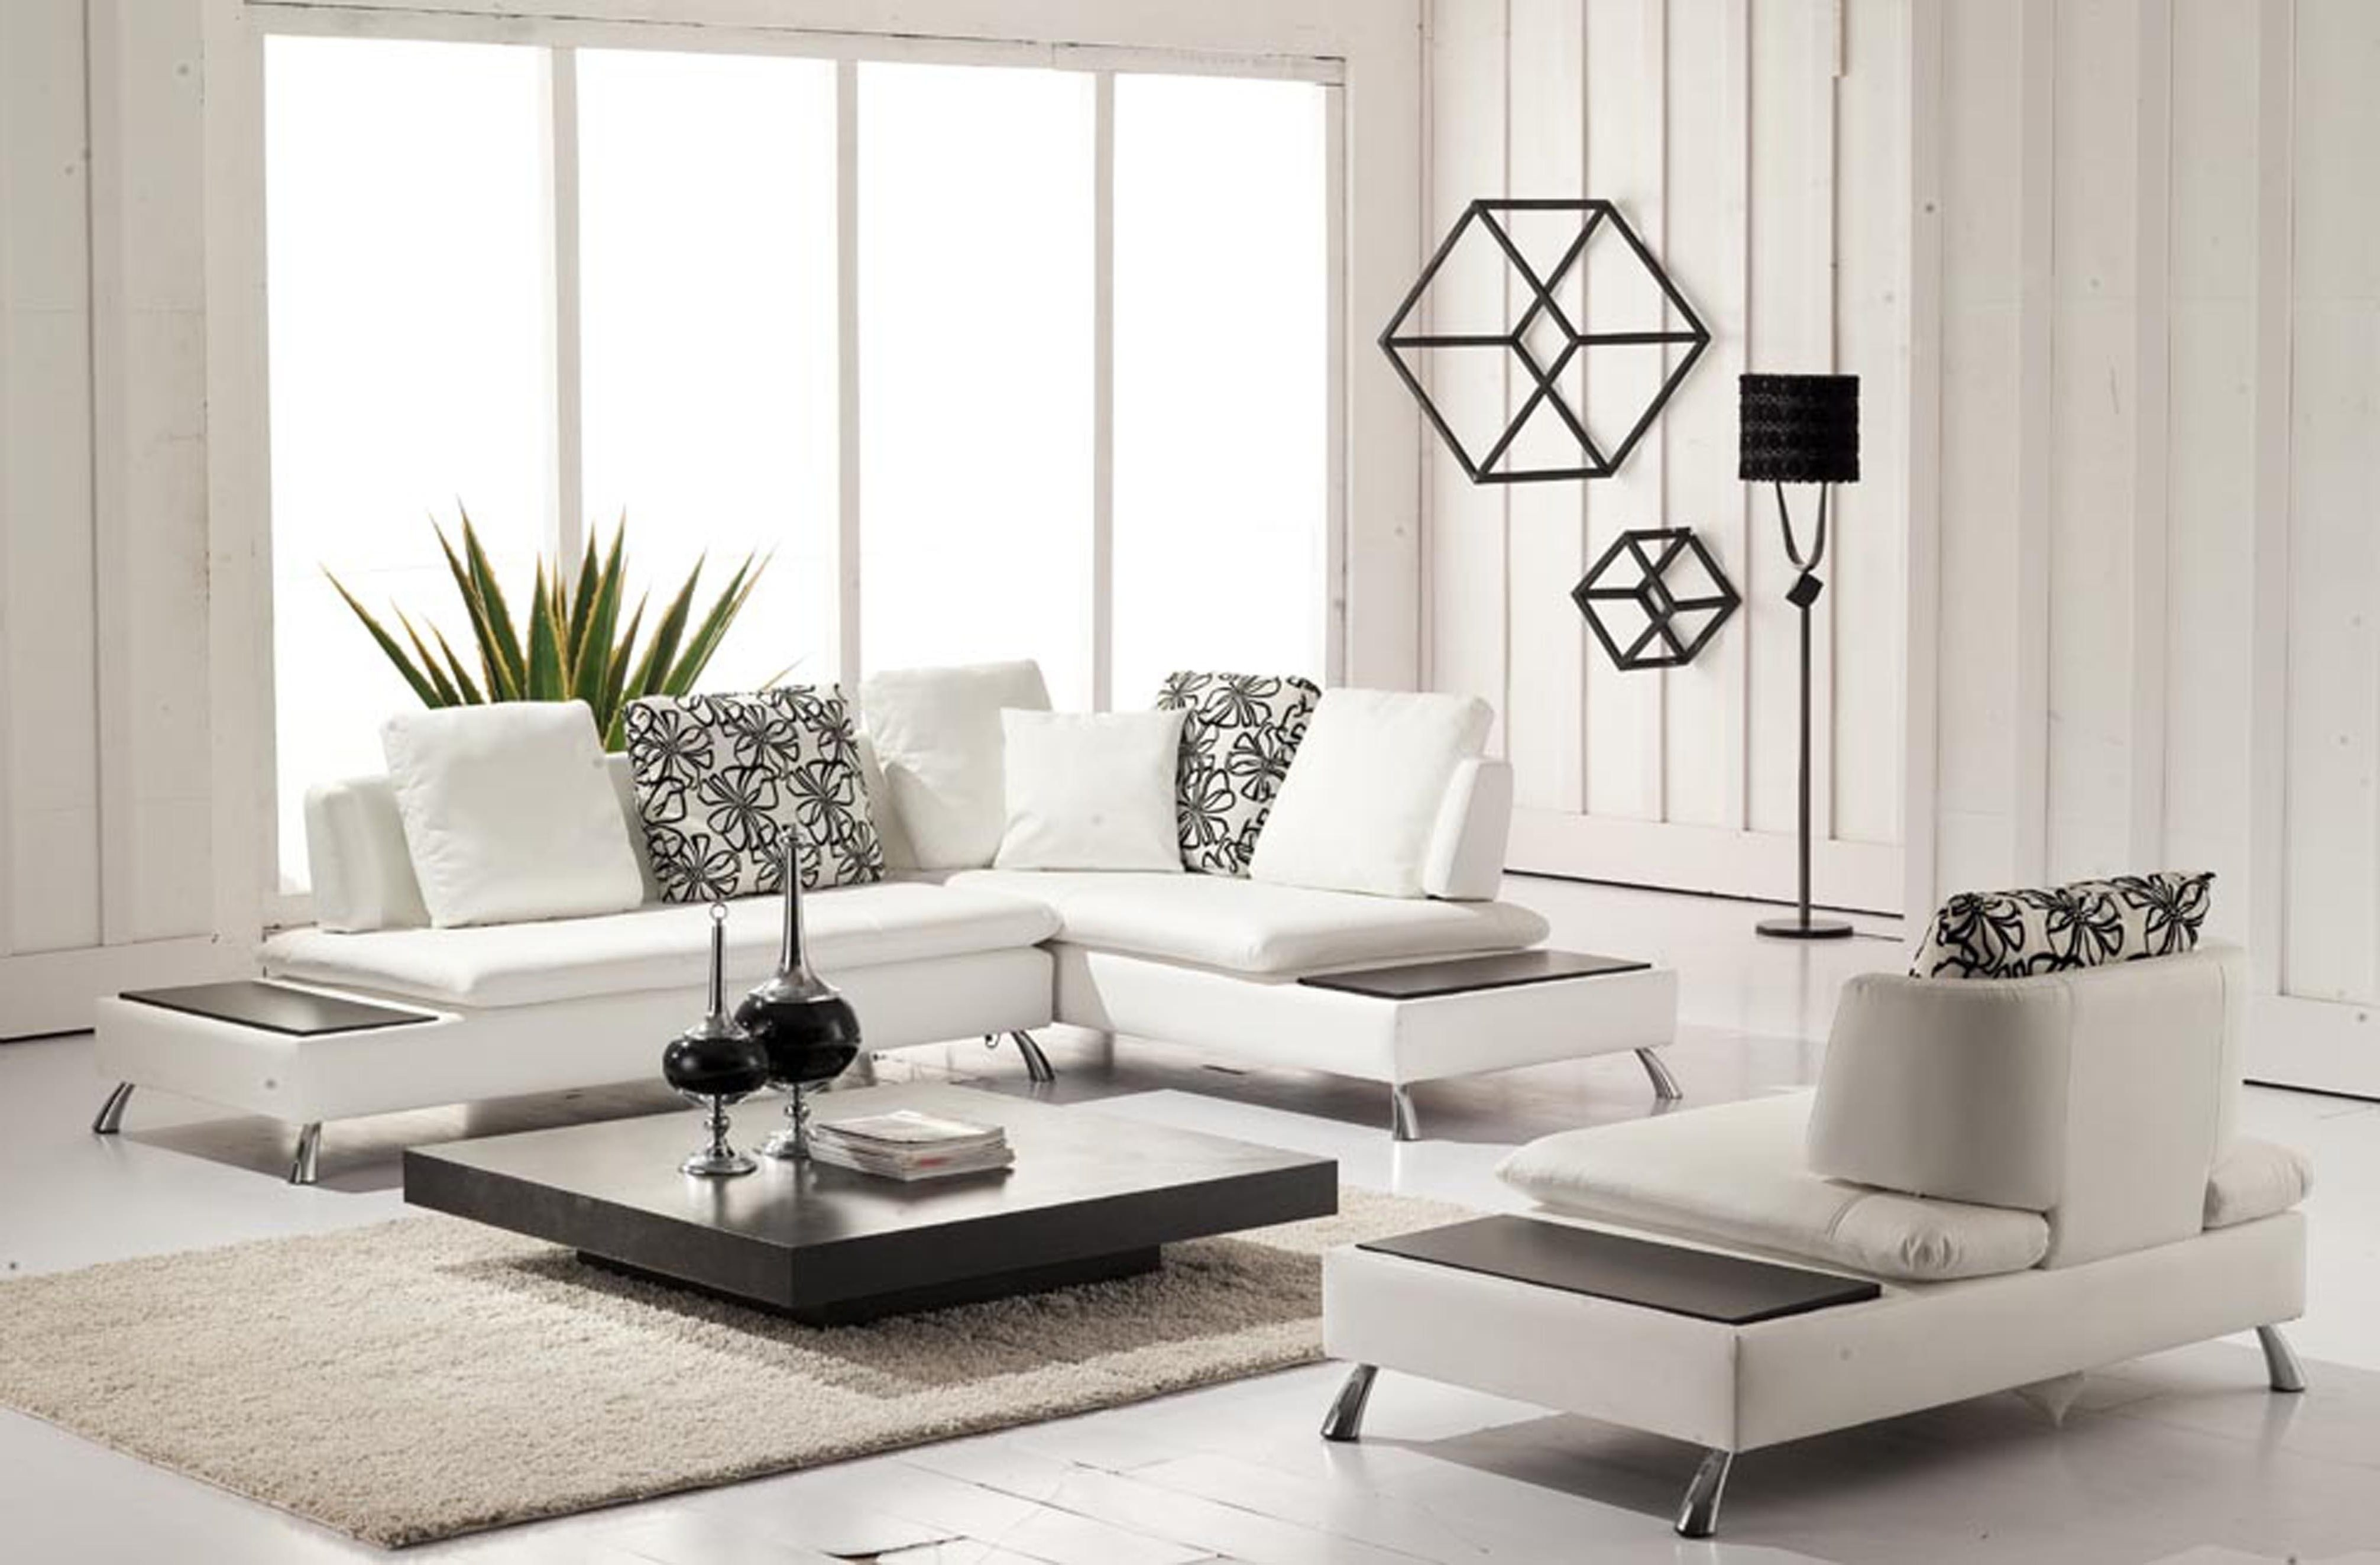 El Dorado Sectional Sofas Glass Table On Laminate Flooring White Regarding El Dorado Sectional Sofas (View 5 of 10)